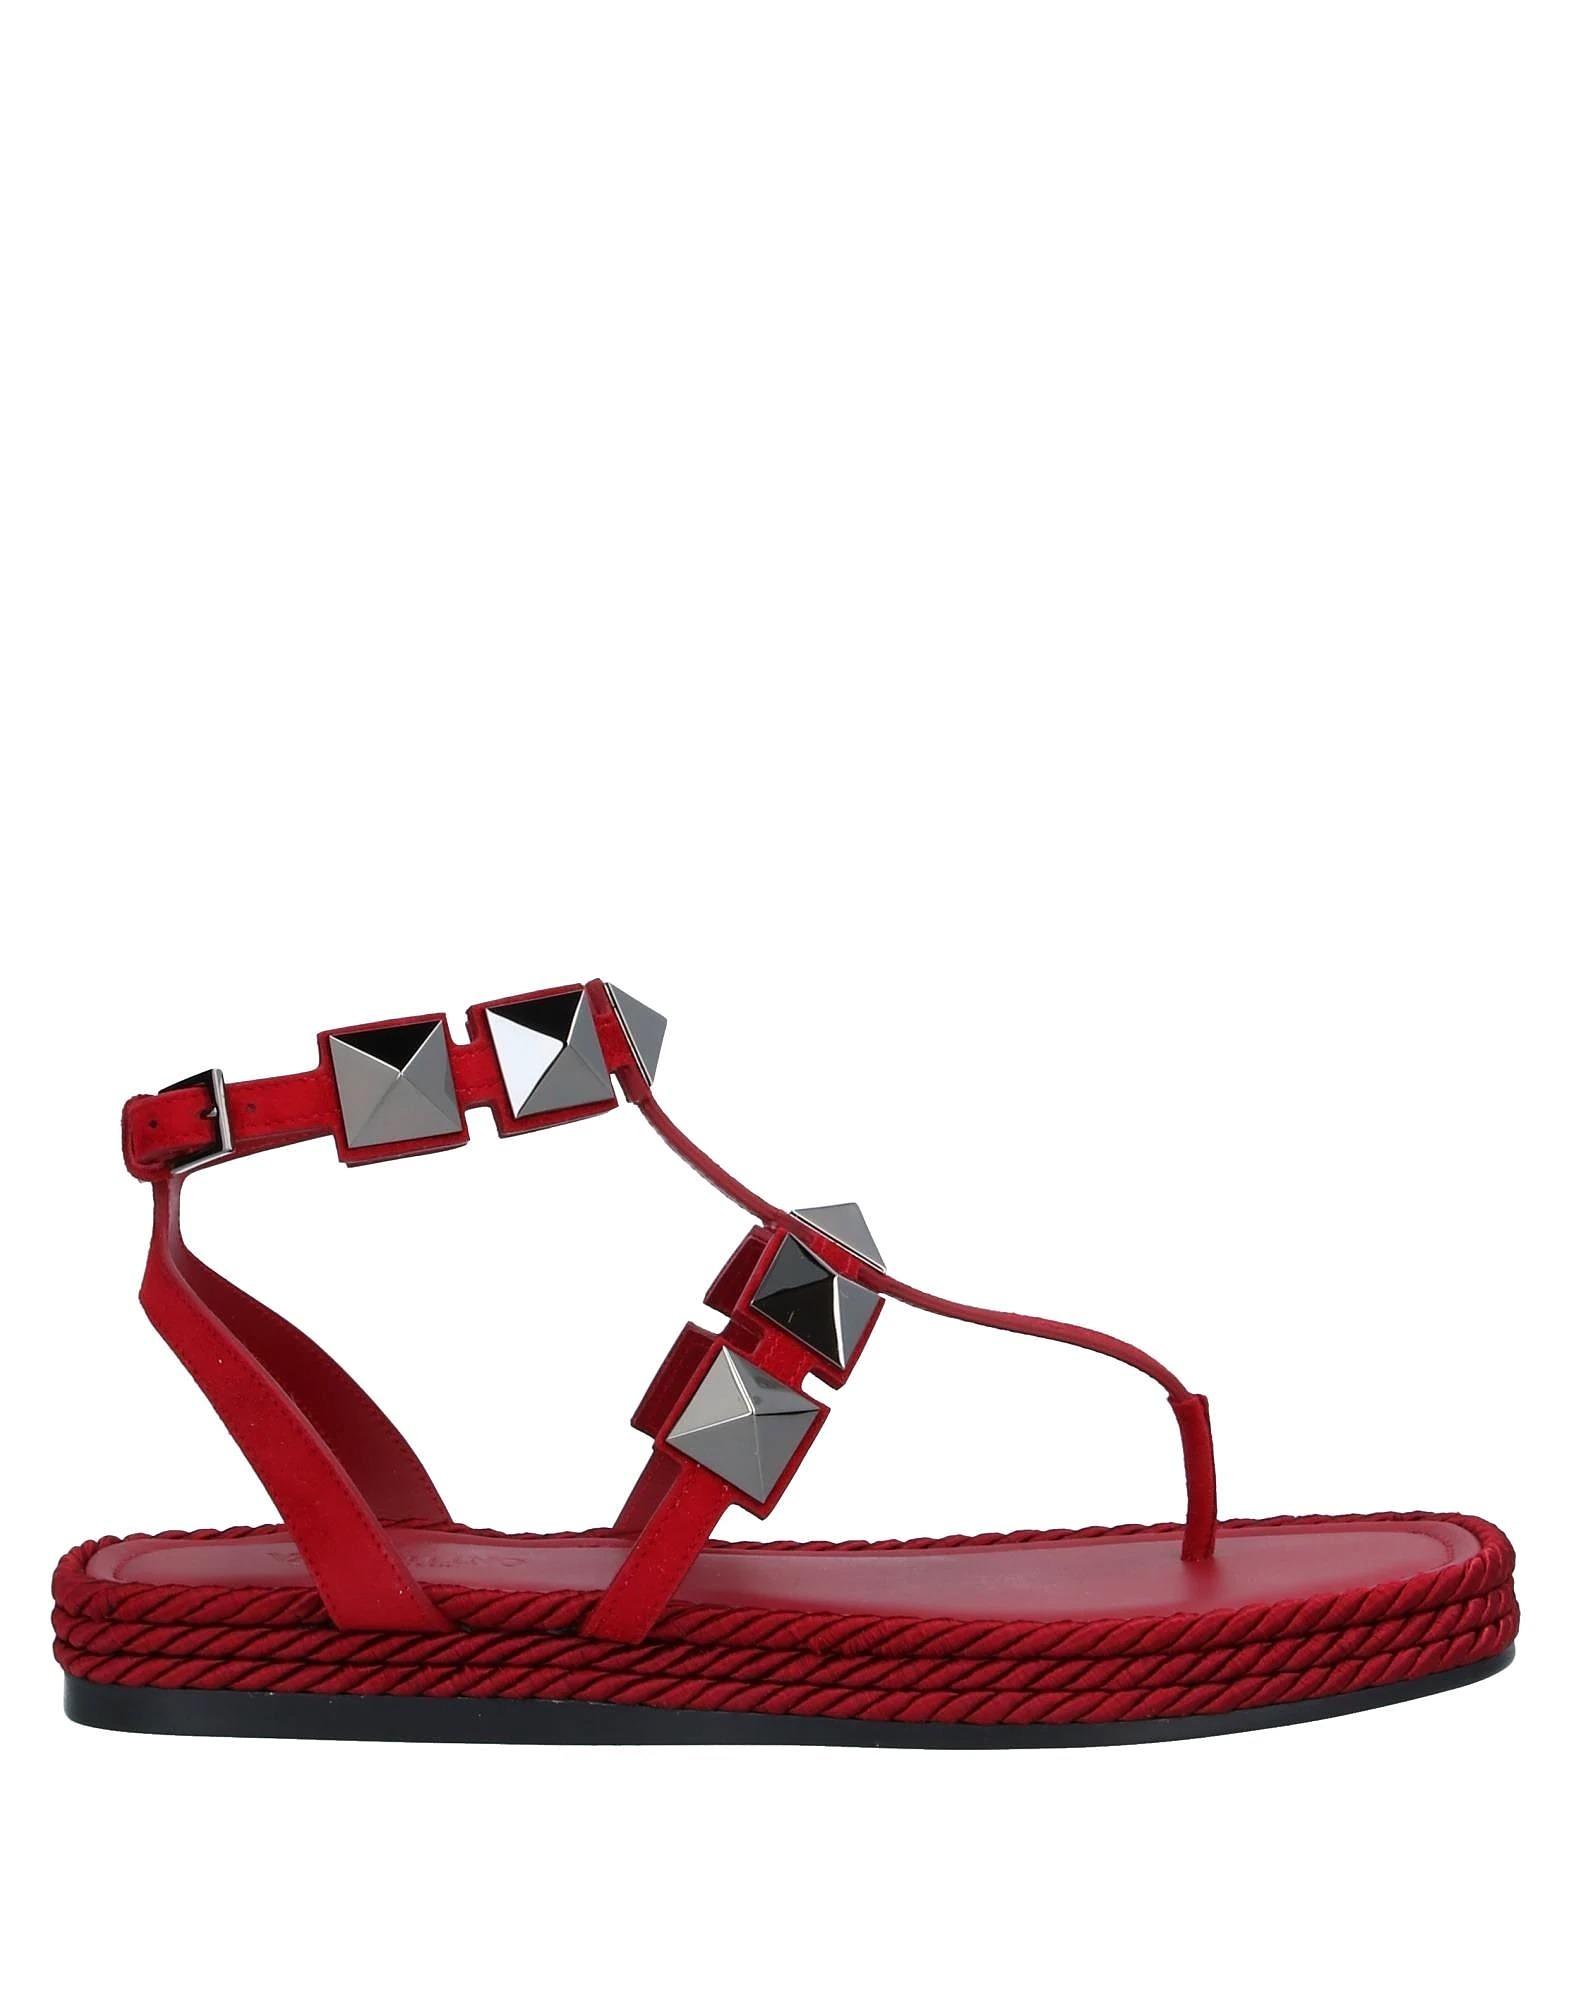 Sandalias con tachuelas de gran tamaño de Valentino.